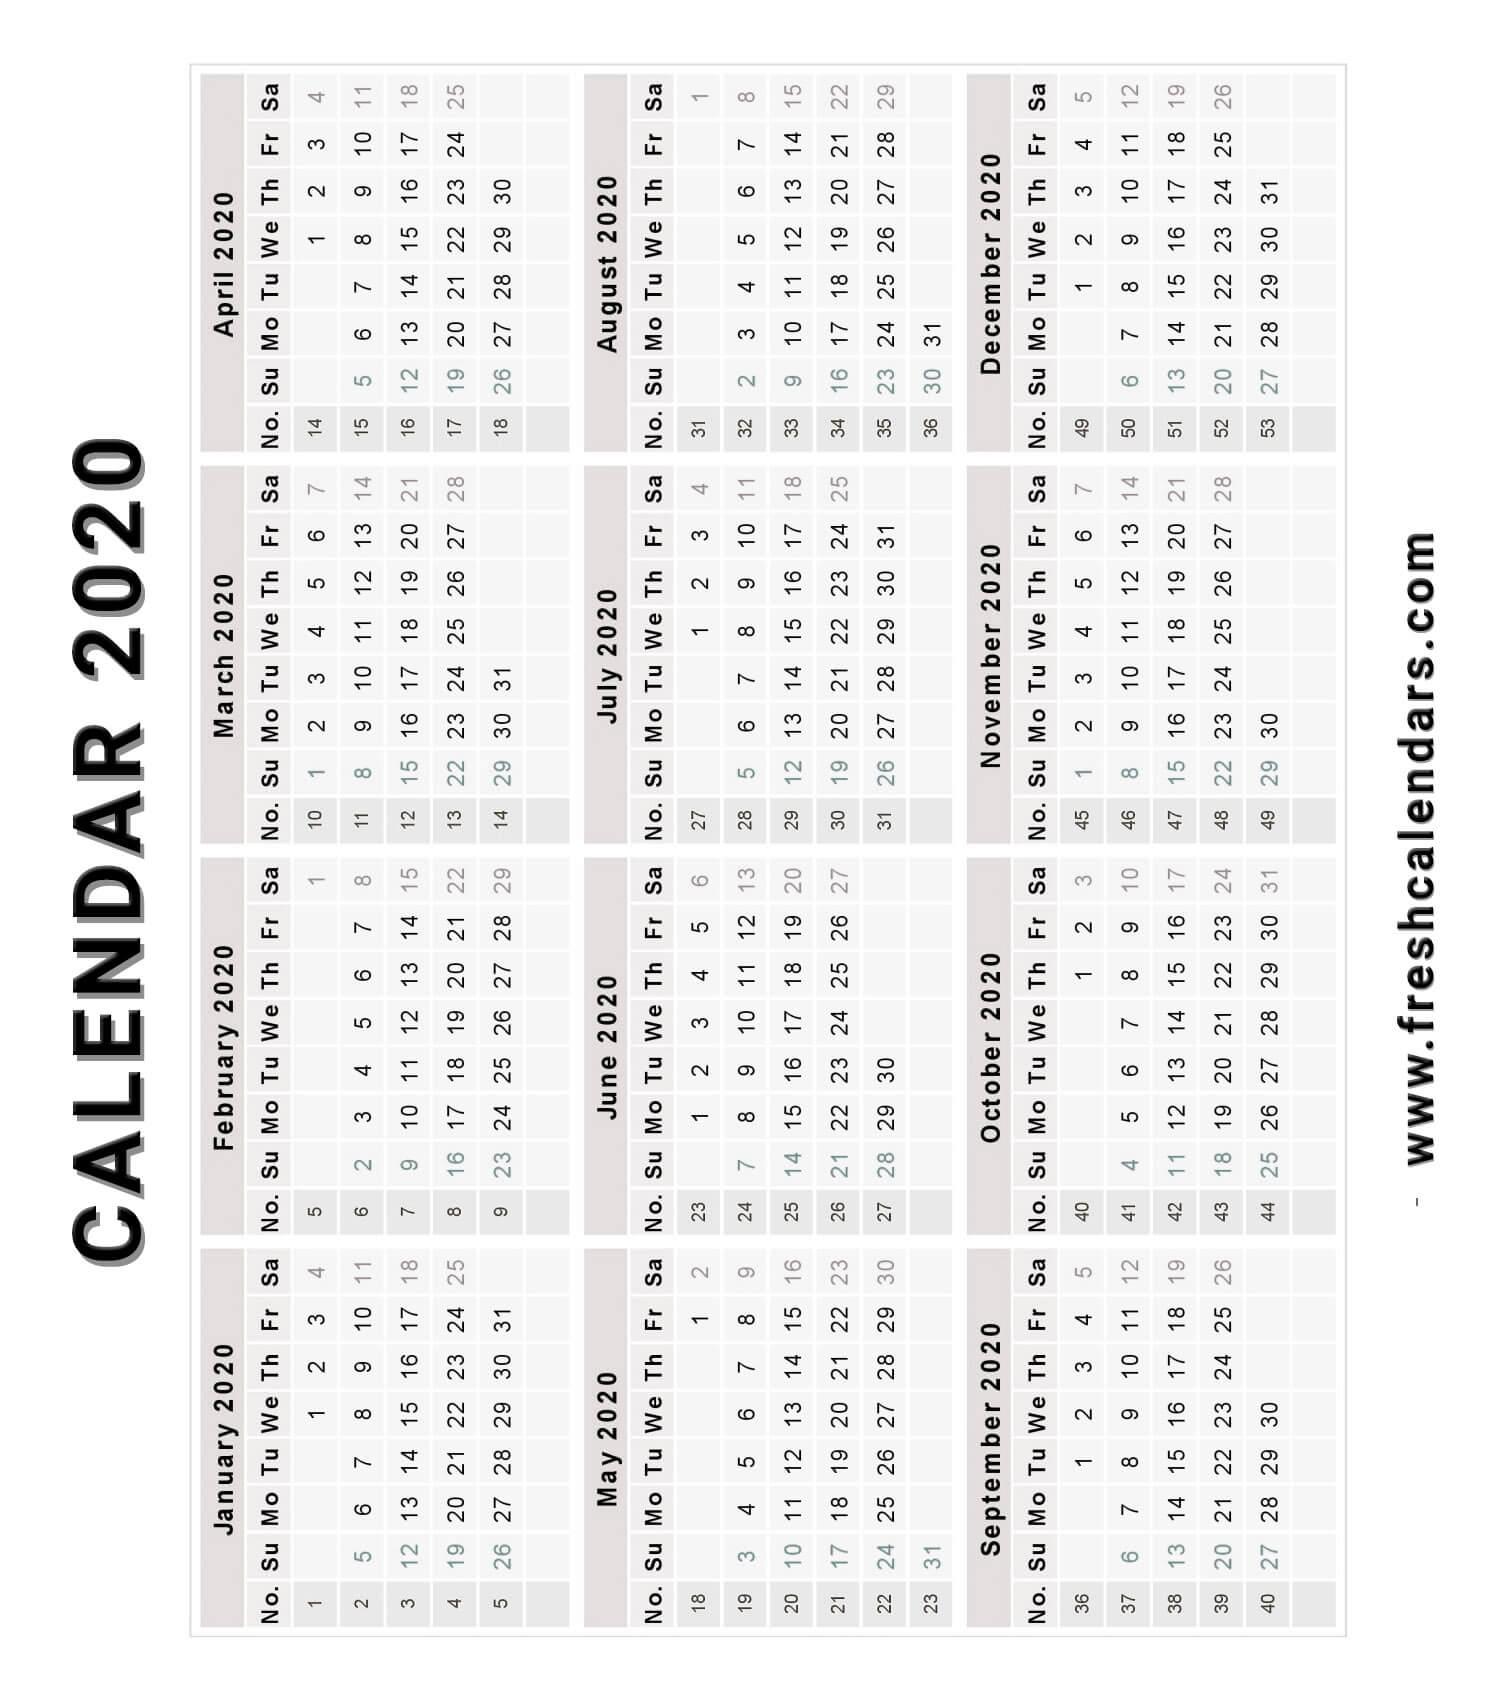 Bangla Calendar 2019 Pdf  Google Search within Berkeley 2020-2020 Calendar